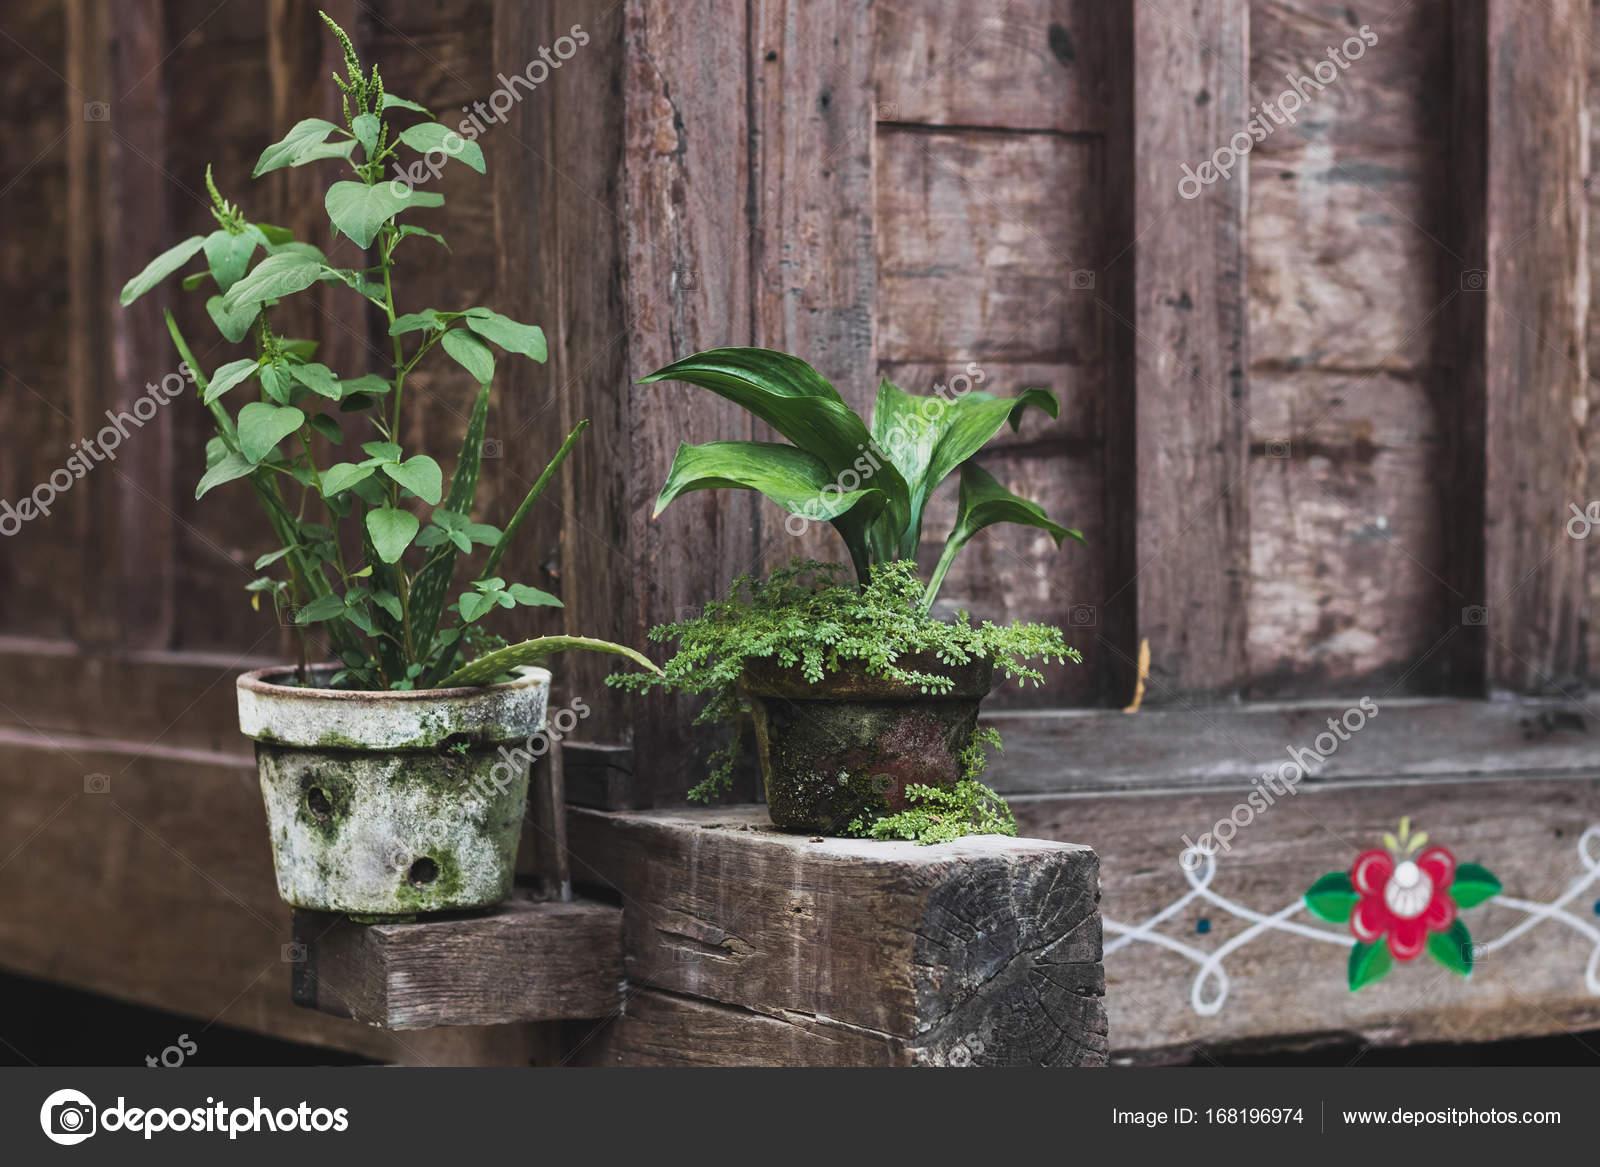 Dekoration des Hauses mit Pflanzen — Stockfoto © olegbreslavtsev ...